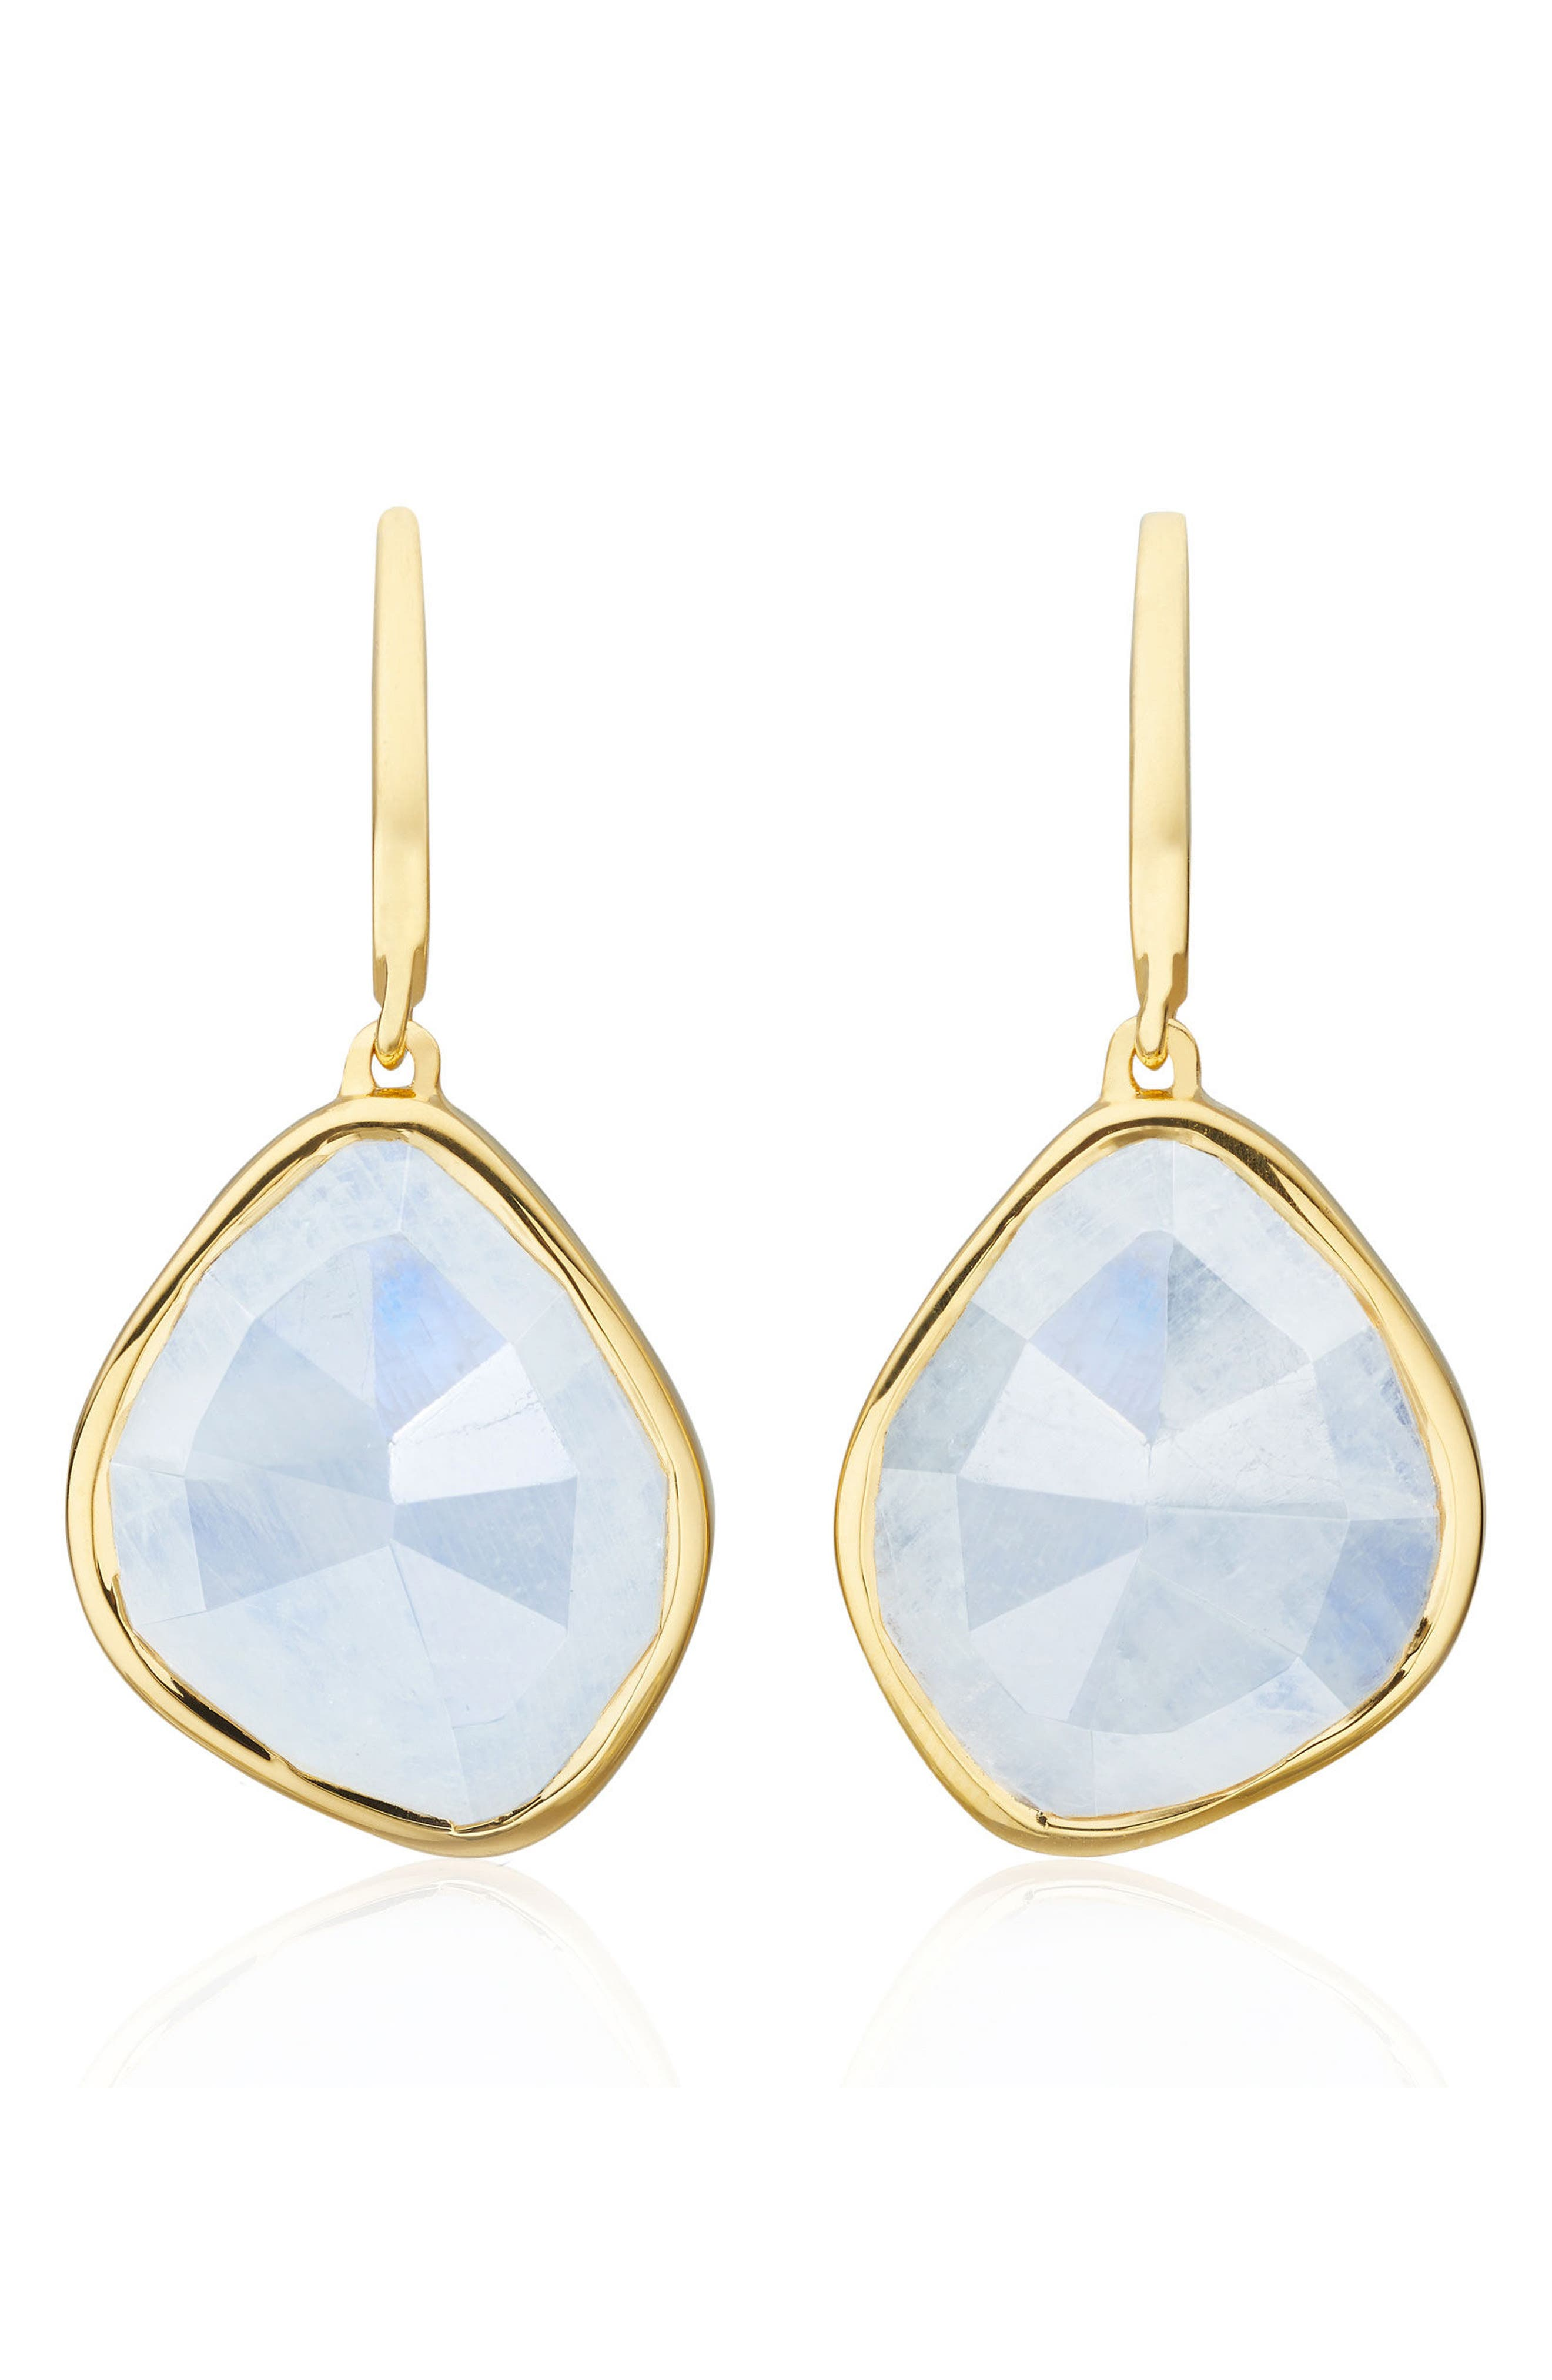 Siren Nugget Semiprecious Stone Drop Earrings,                         Main,                         color, Yellow Gold/ Moonstone